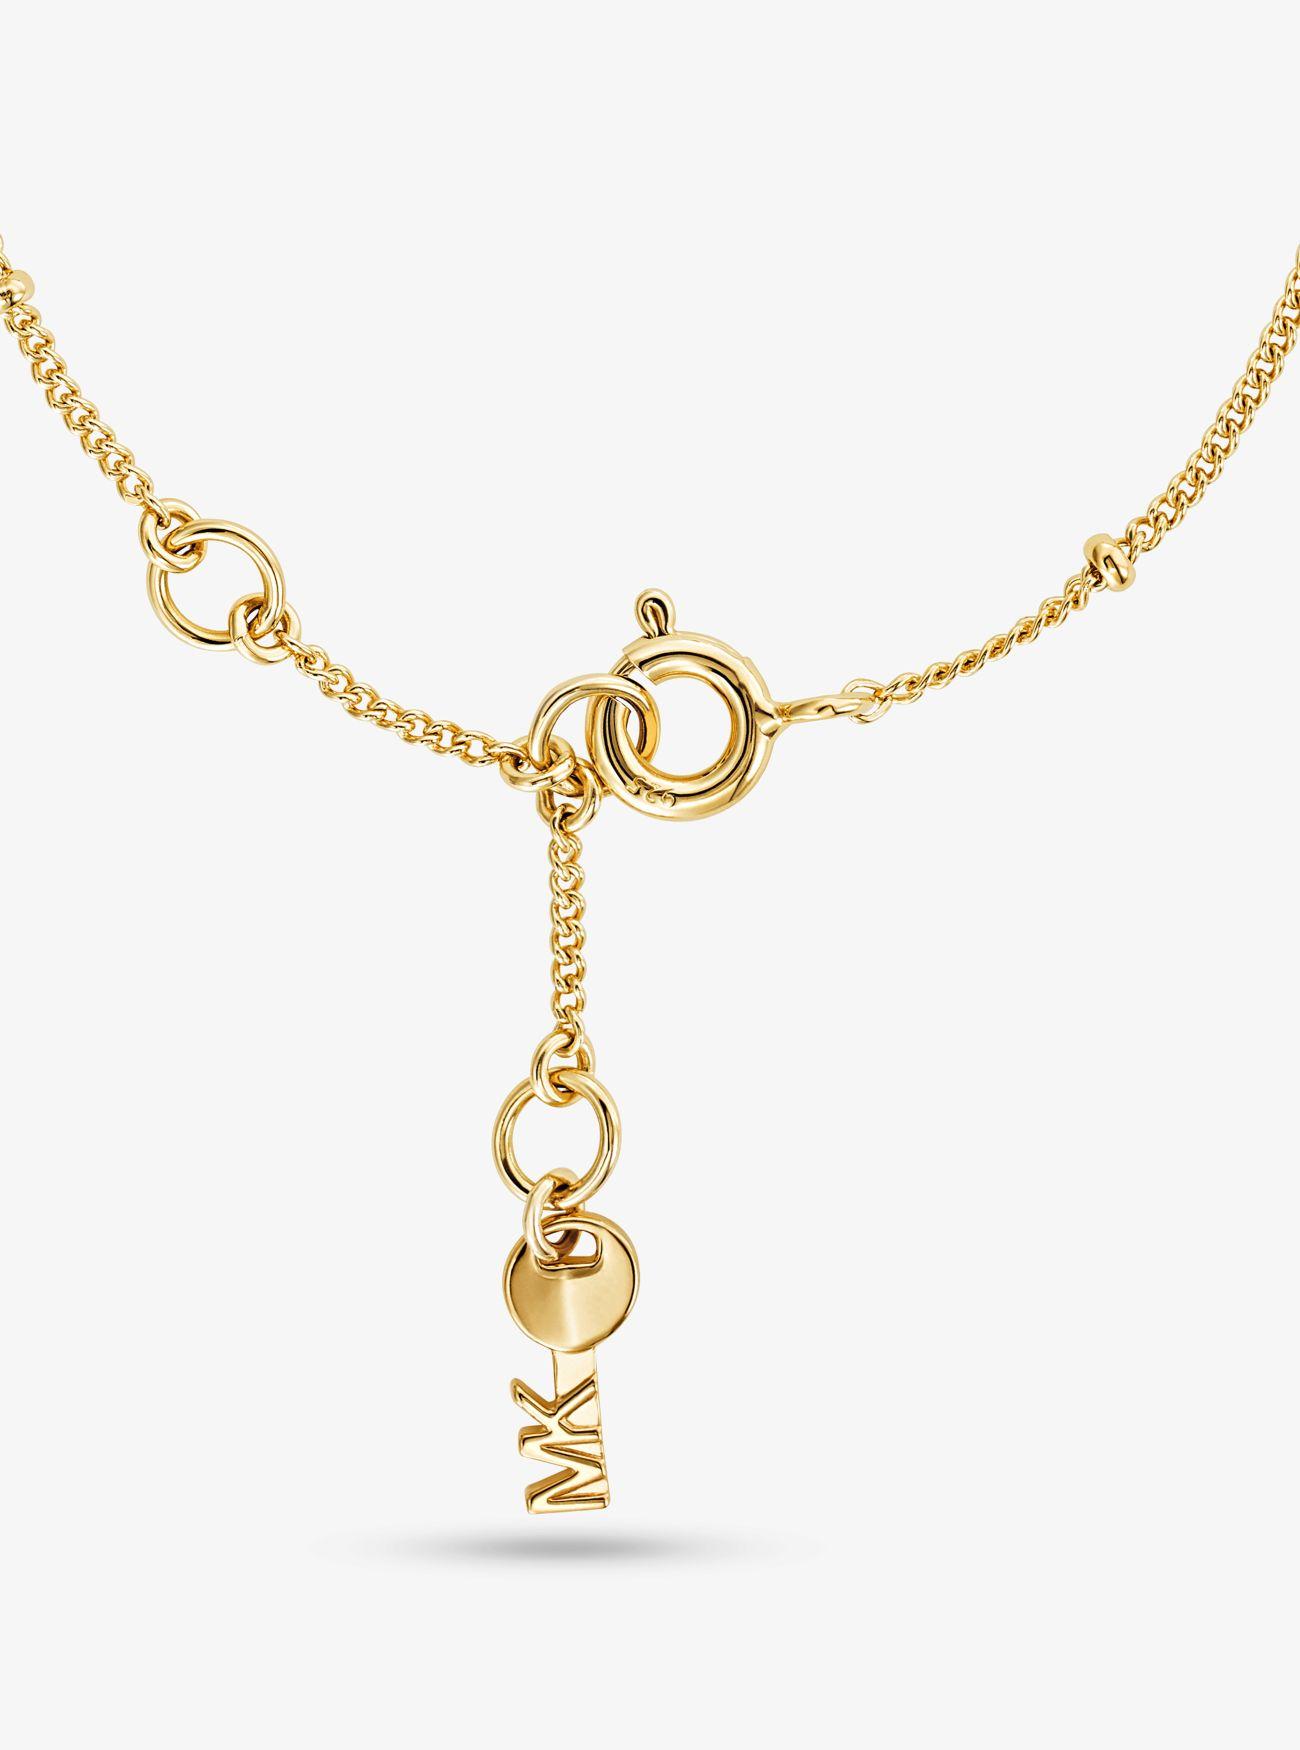 f793f3416d6e Pulsera con candado de plata de ley con chapado en oro de 14 K